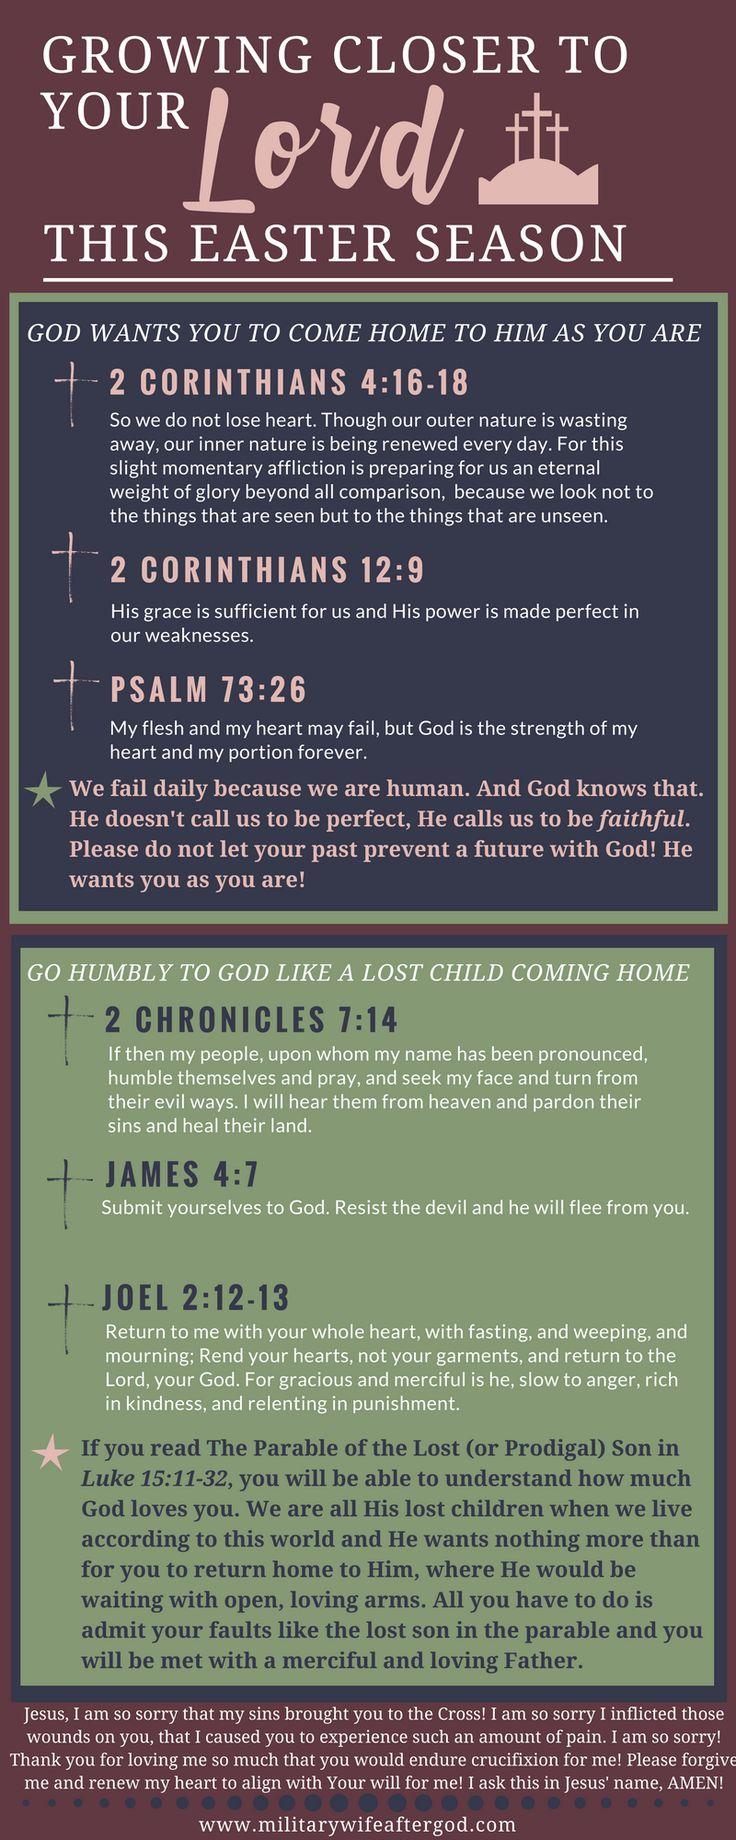 Beginning a True Relationship with God through